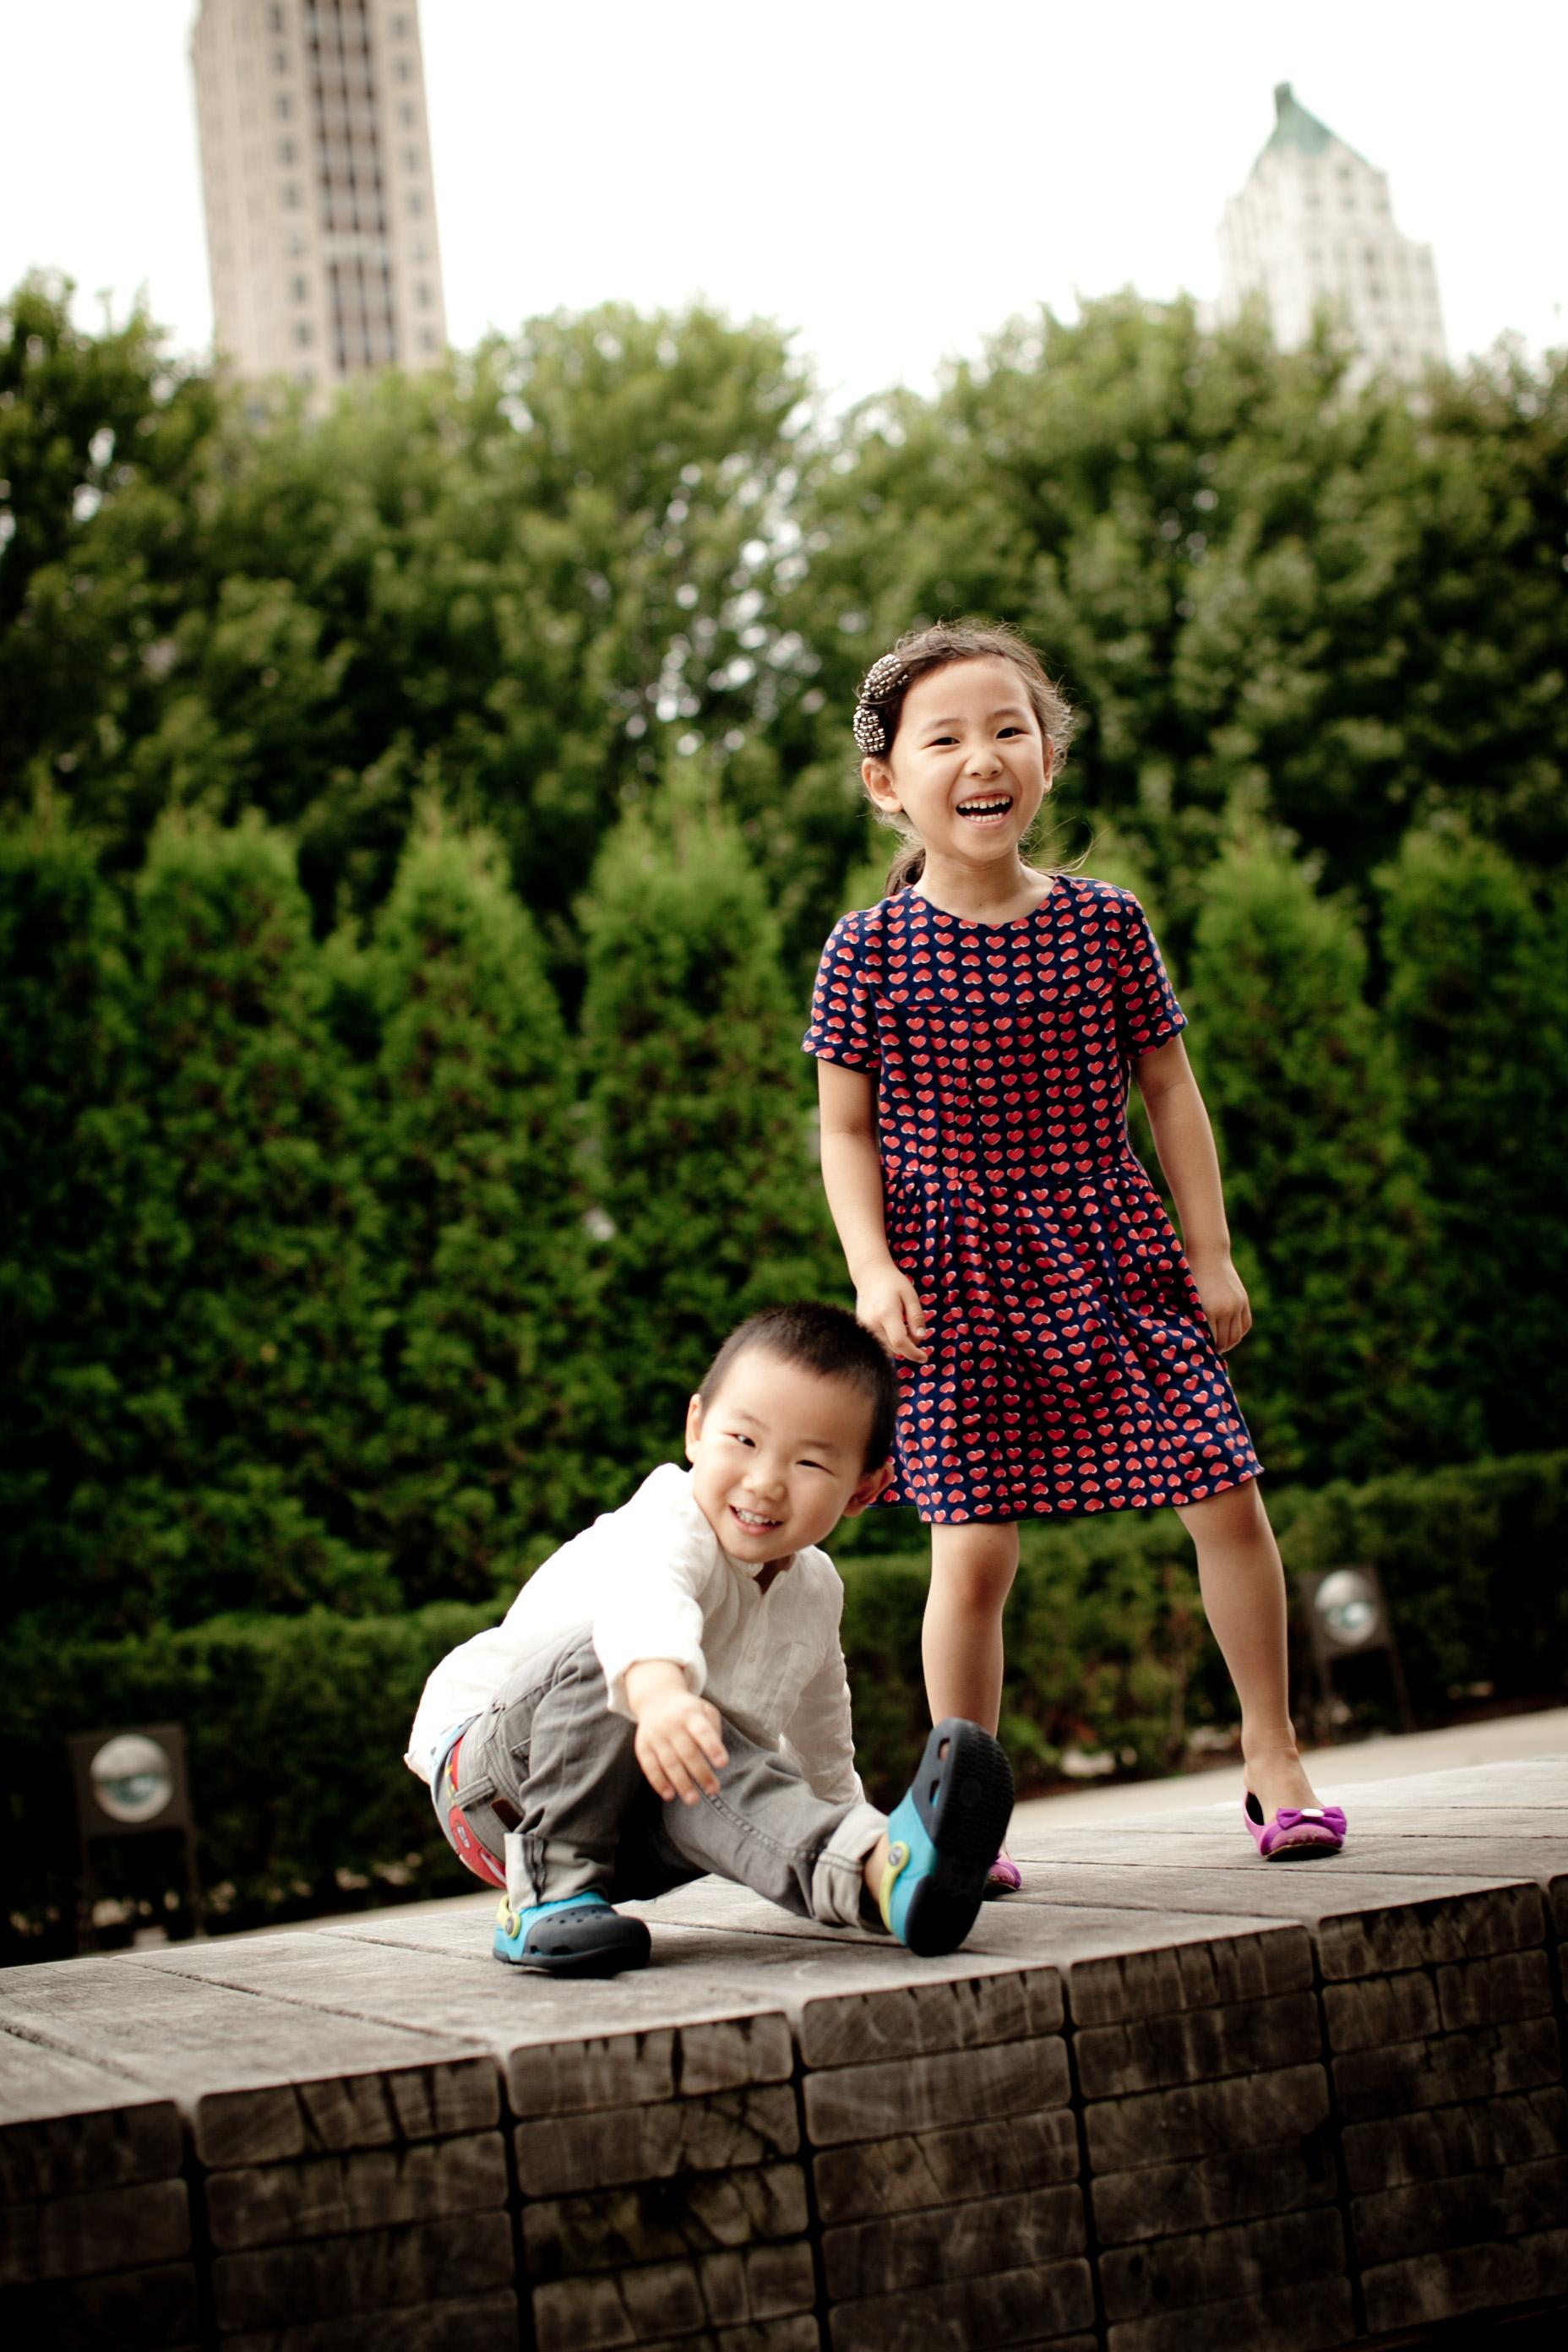 wendi & rudi lifestyle family photo session lurie gardens millenium park chicago blog-0009.jpg